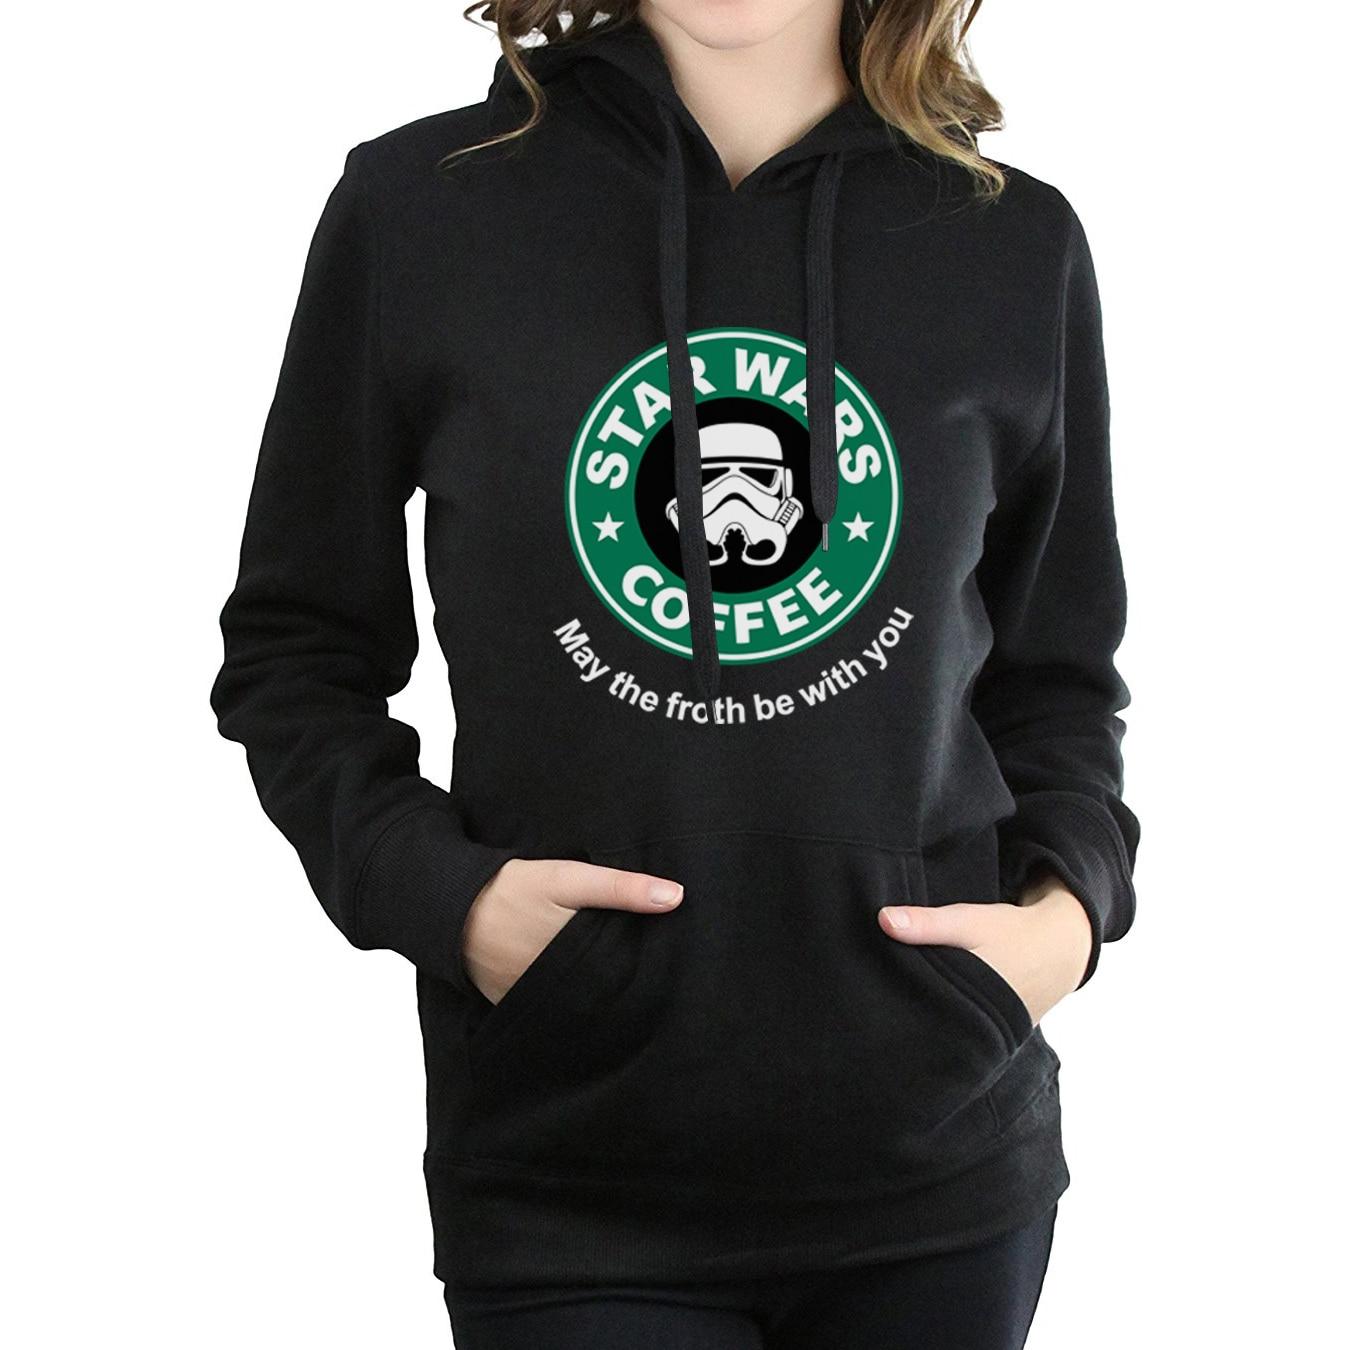 funny harajuku hoodies women casual Fashion  sweatshirt 2019 hipster fleece kpop tracksuit female hip-hop brand clothing